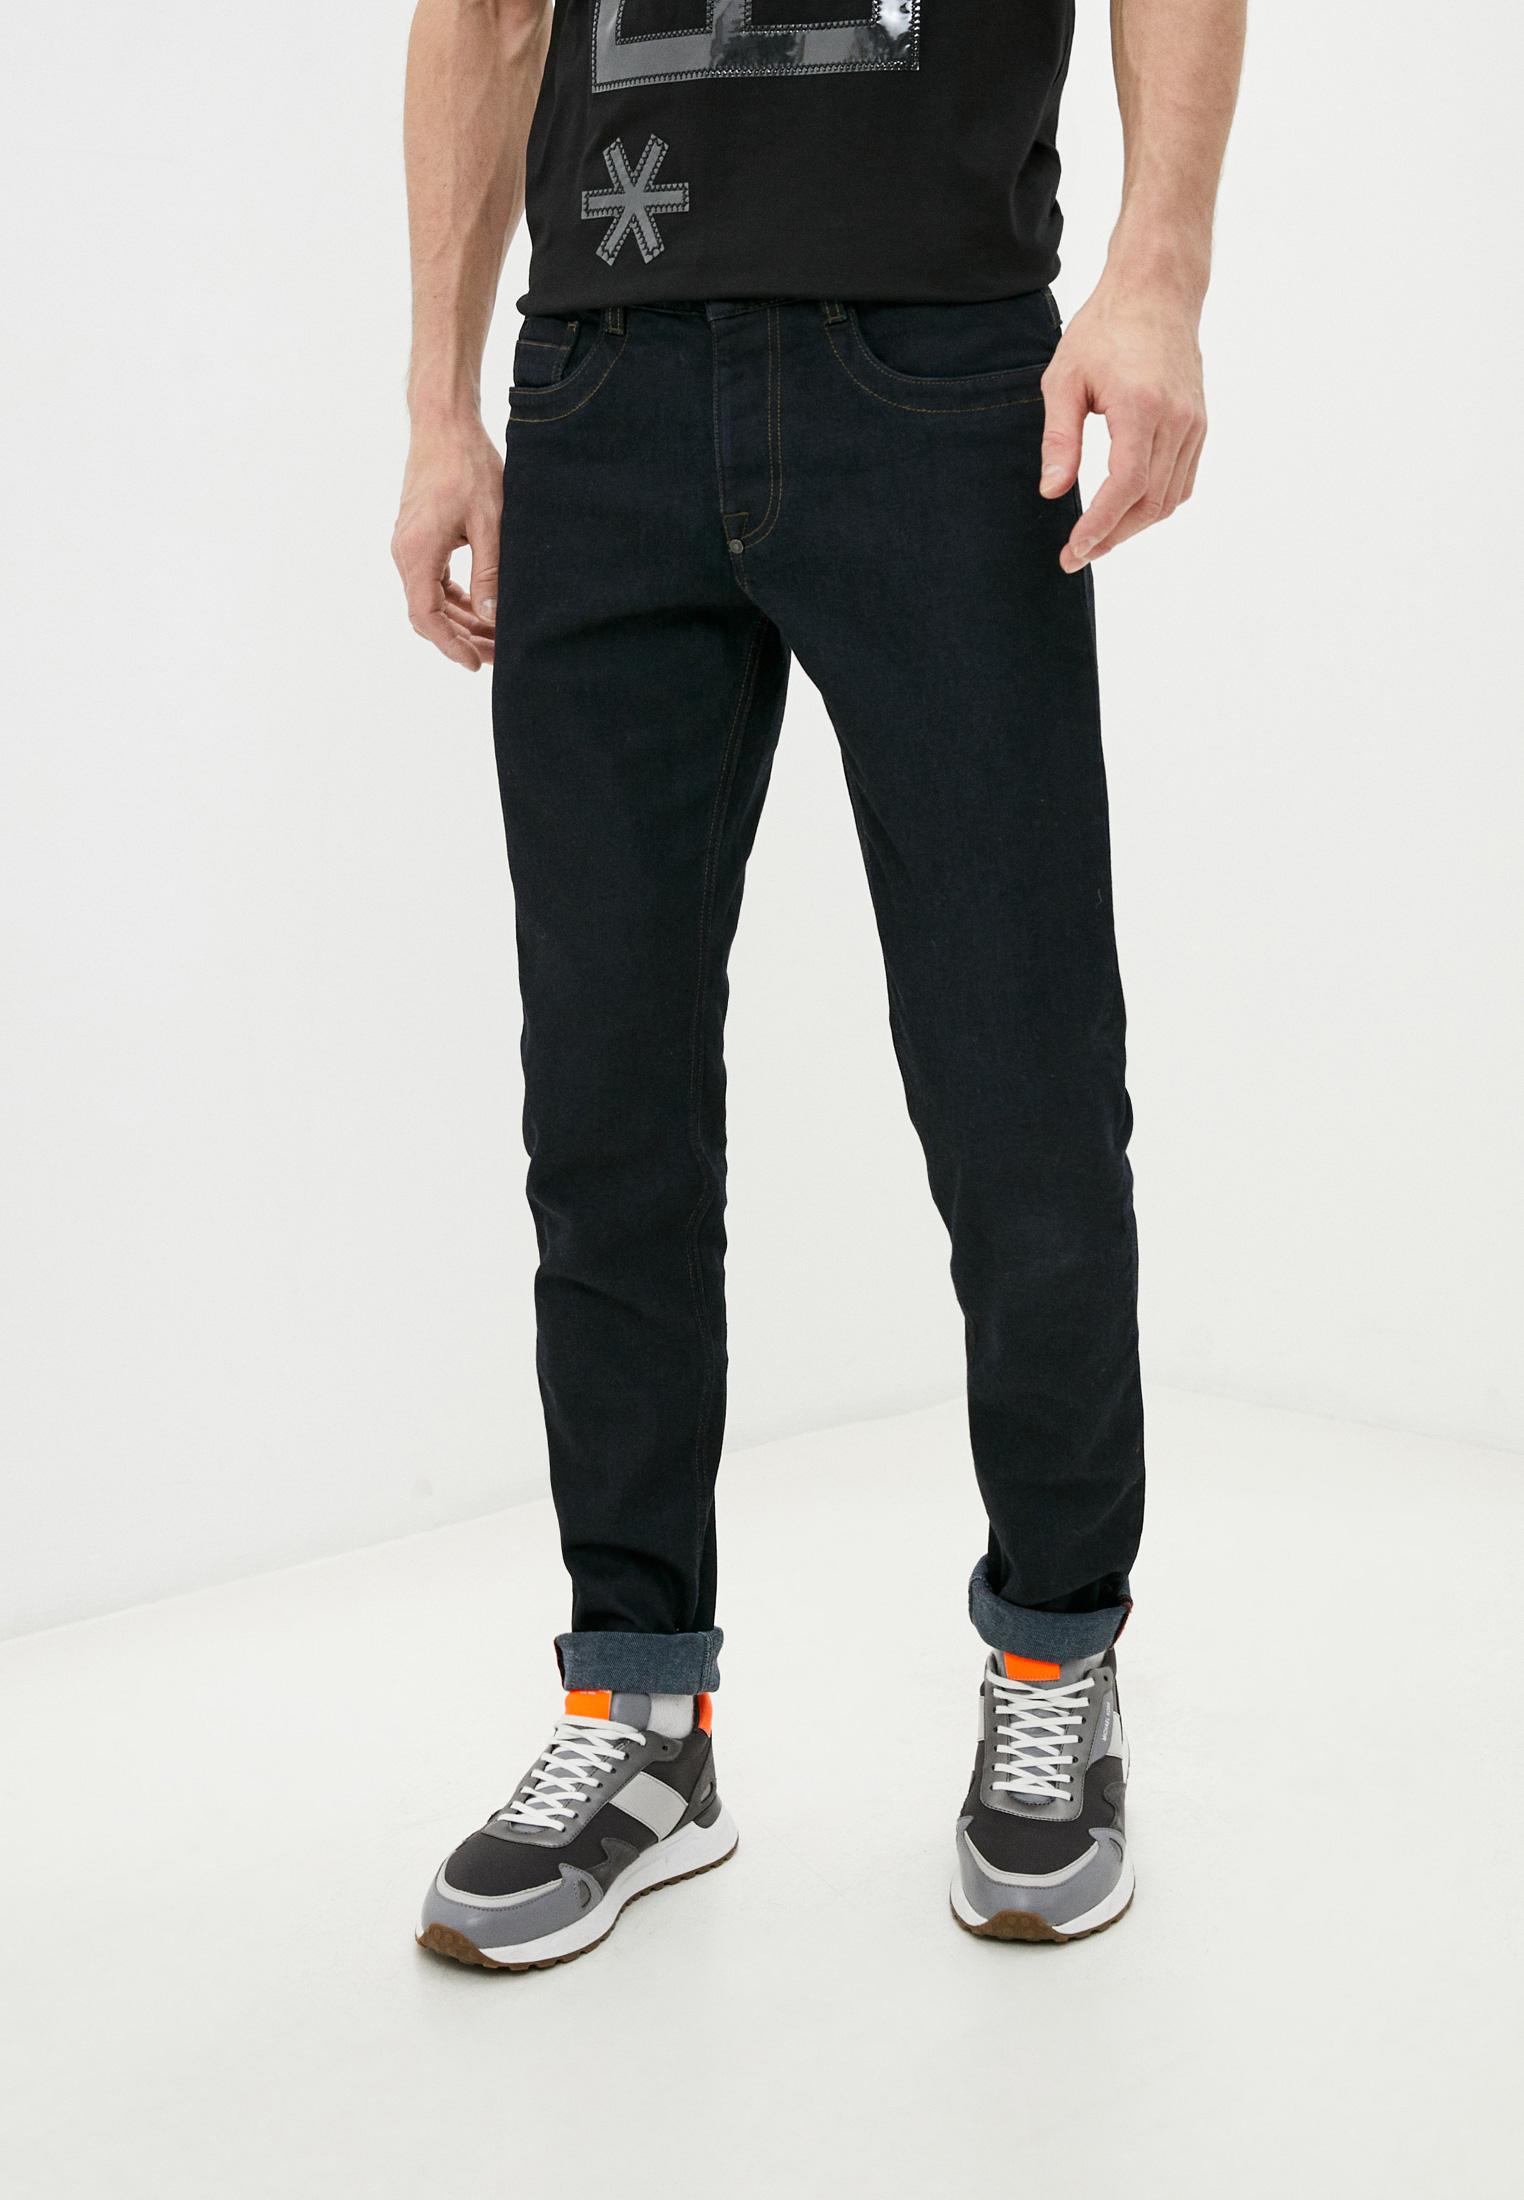 Мужские прямые джинсы Bikkembergs (Биккембергс) C Q 101 01 S 3333